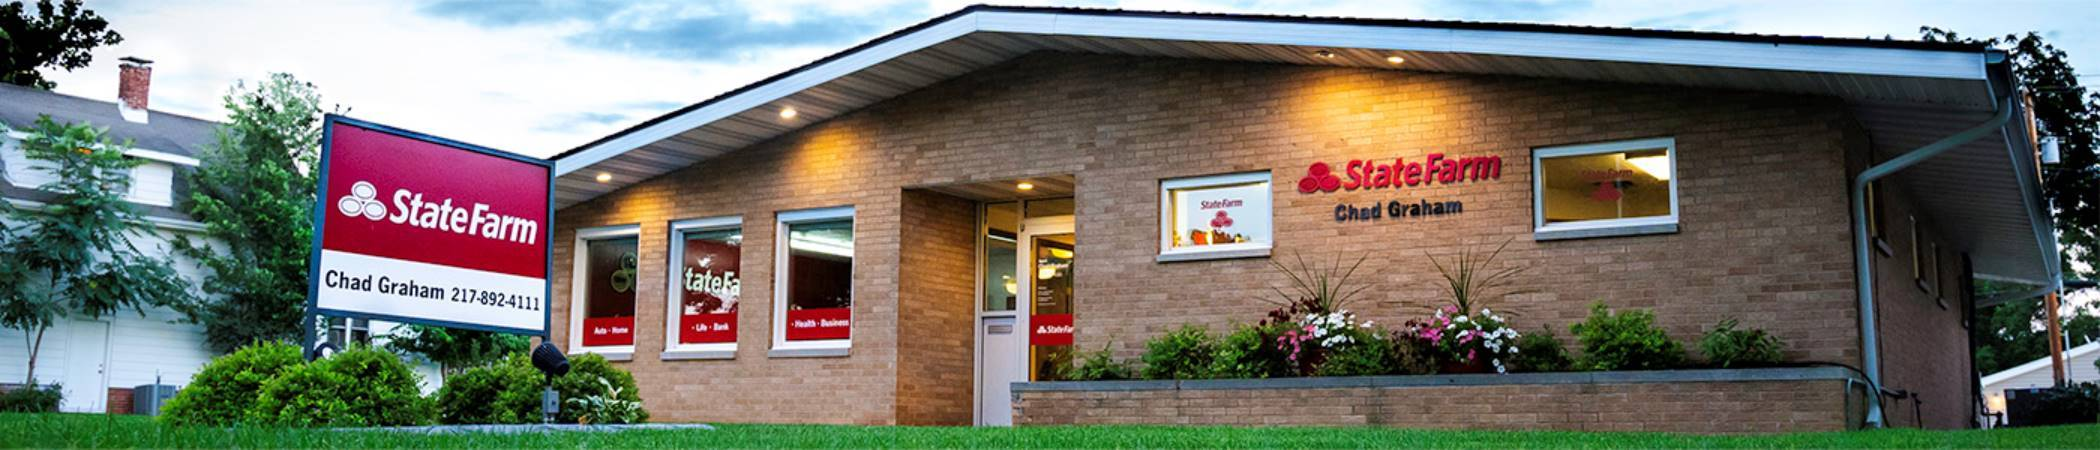 Chad Graham State Farm Insurance in Rantoul, IL | Home, Auto Insurance & more